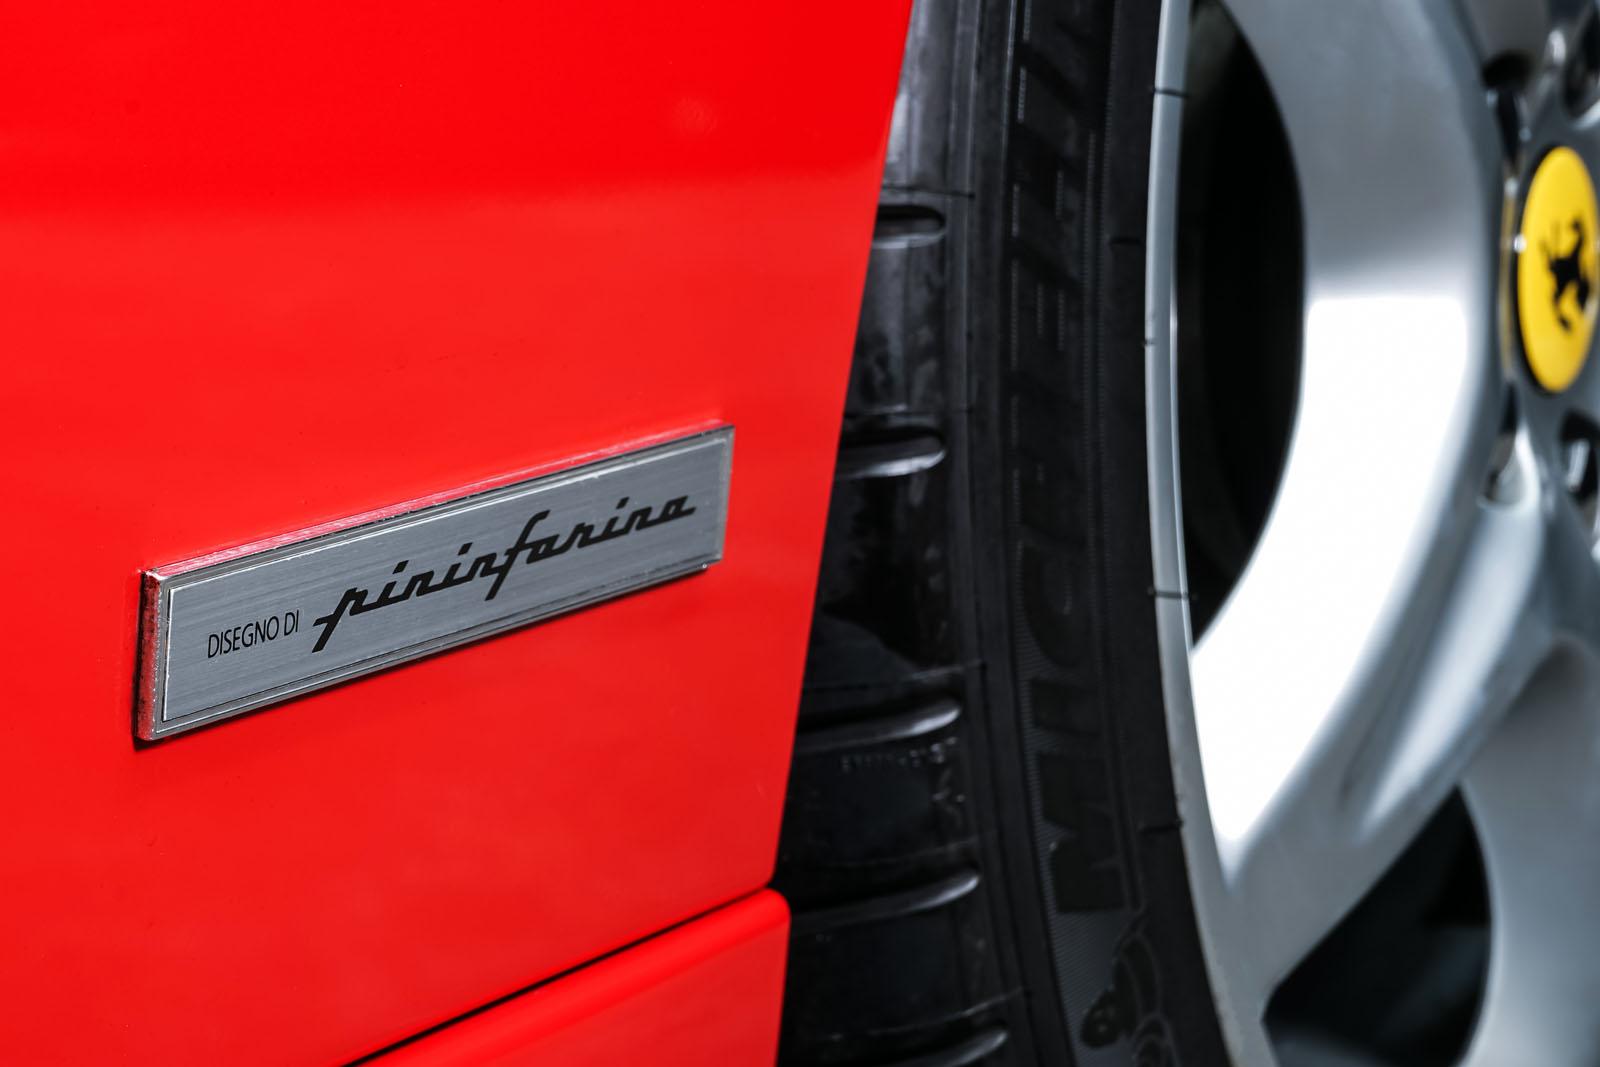 Ferrari_F355_Berlinetta_Rot_Schwarz_FER-7159_11_w